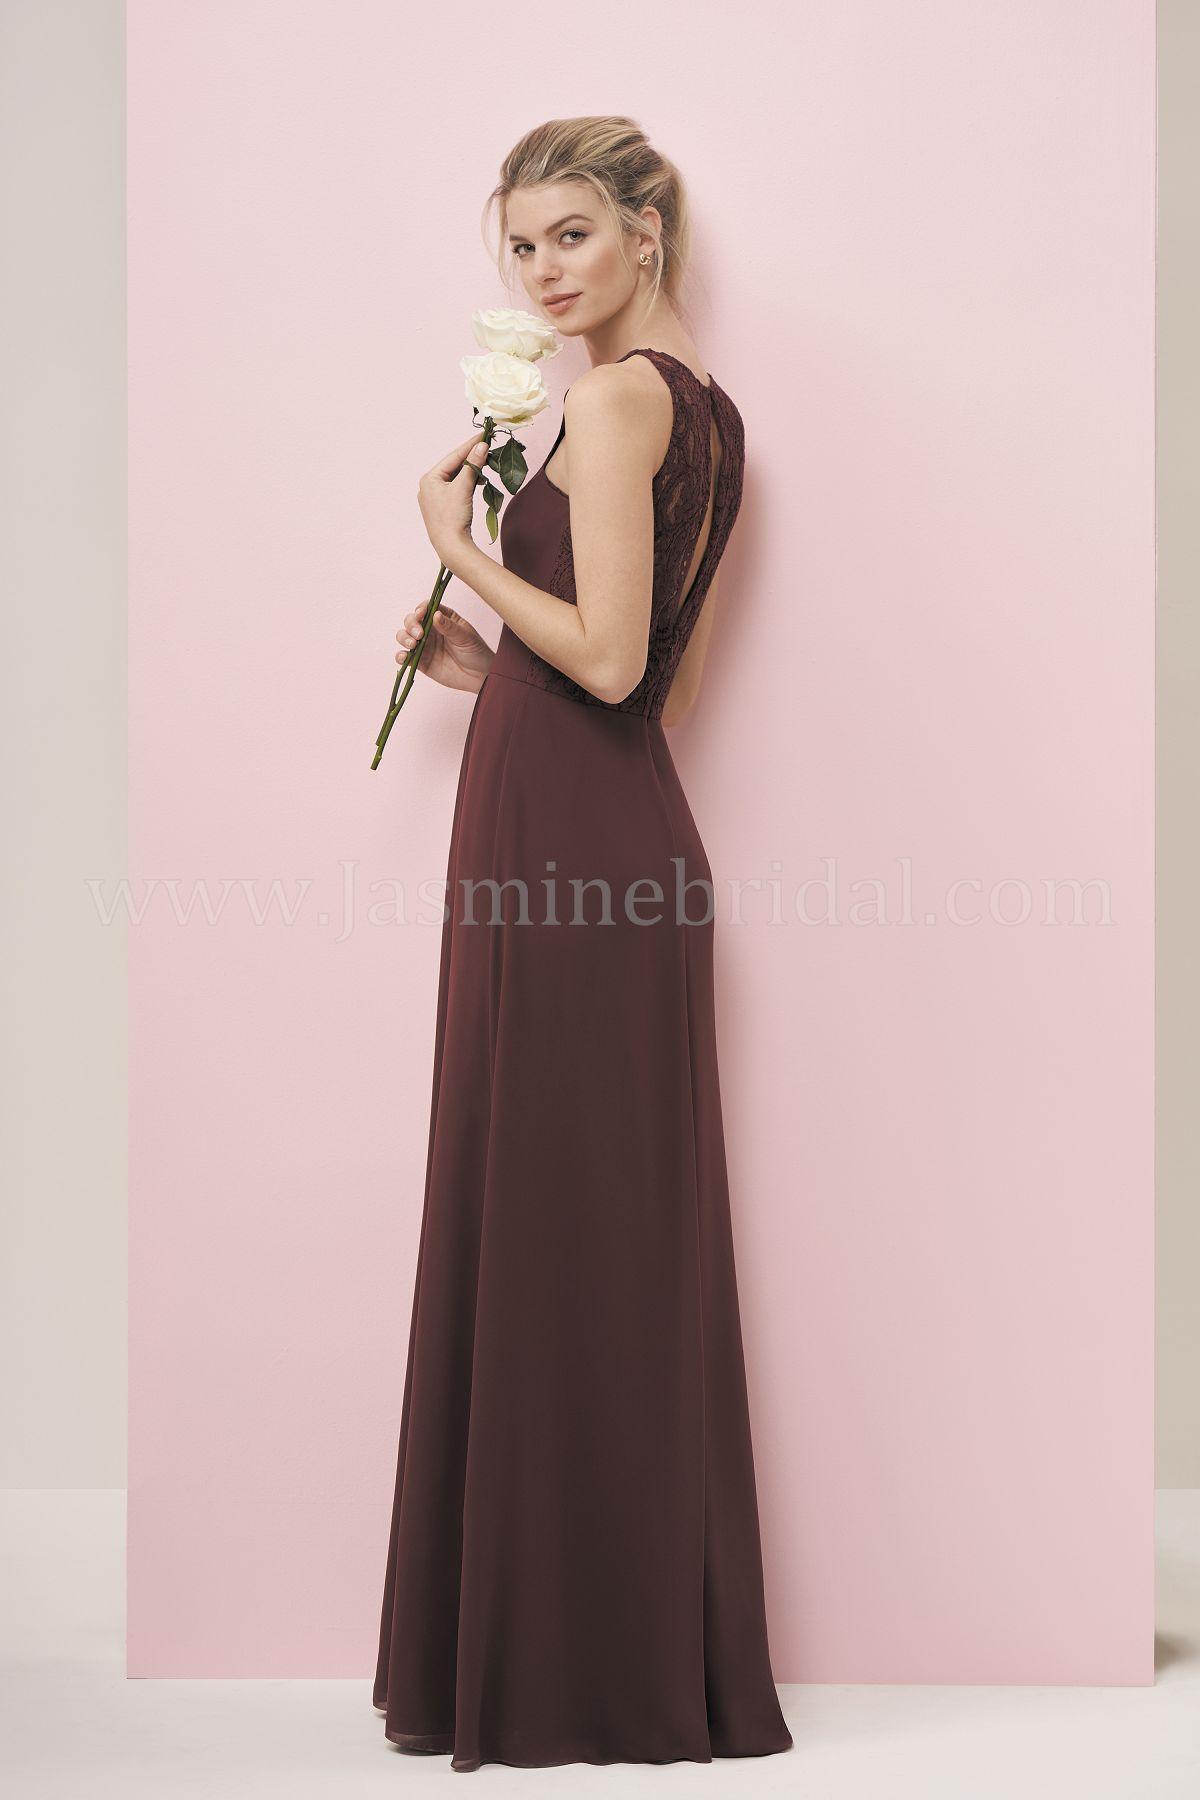 bridesmaid-dresses-P196052-B